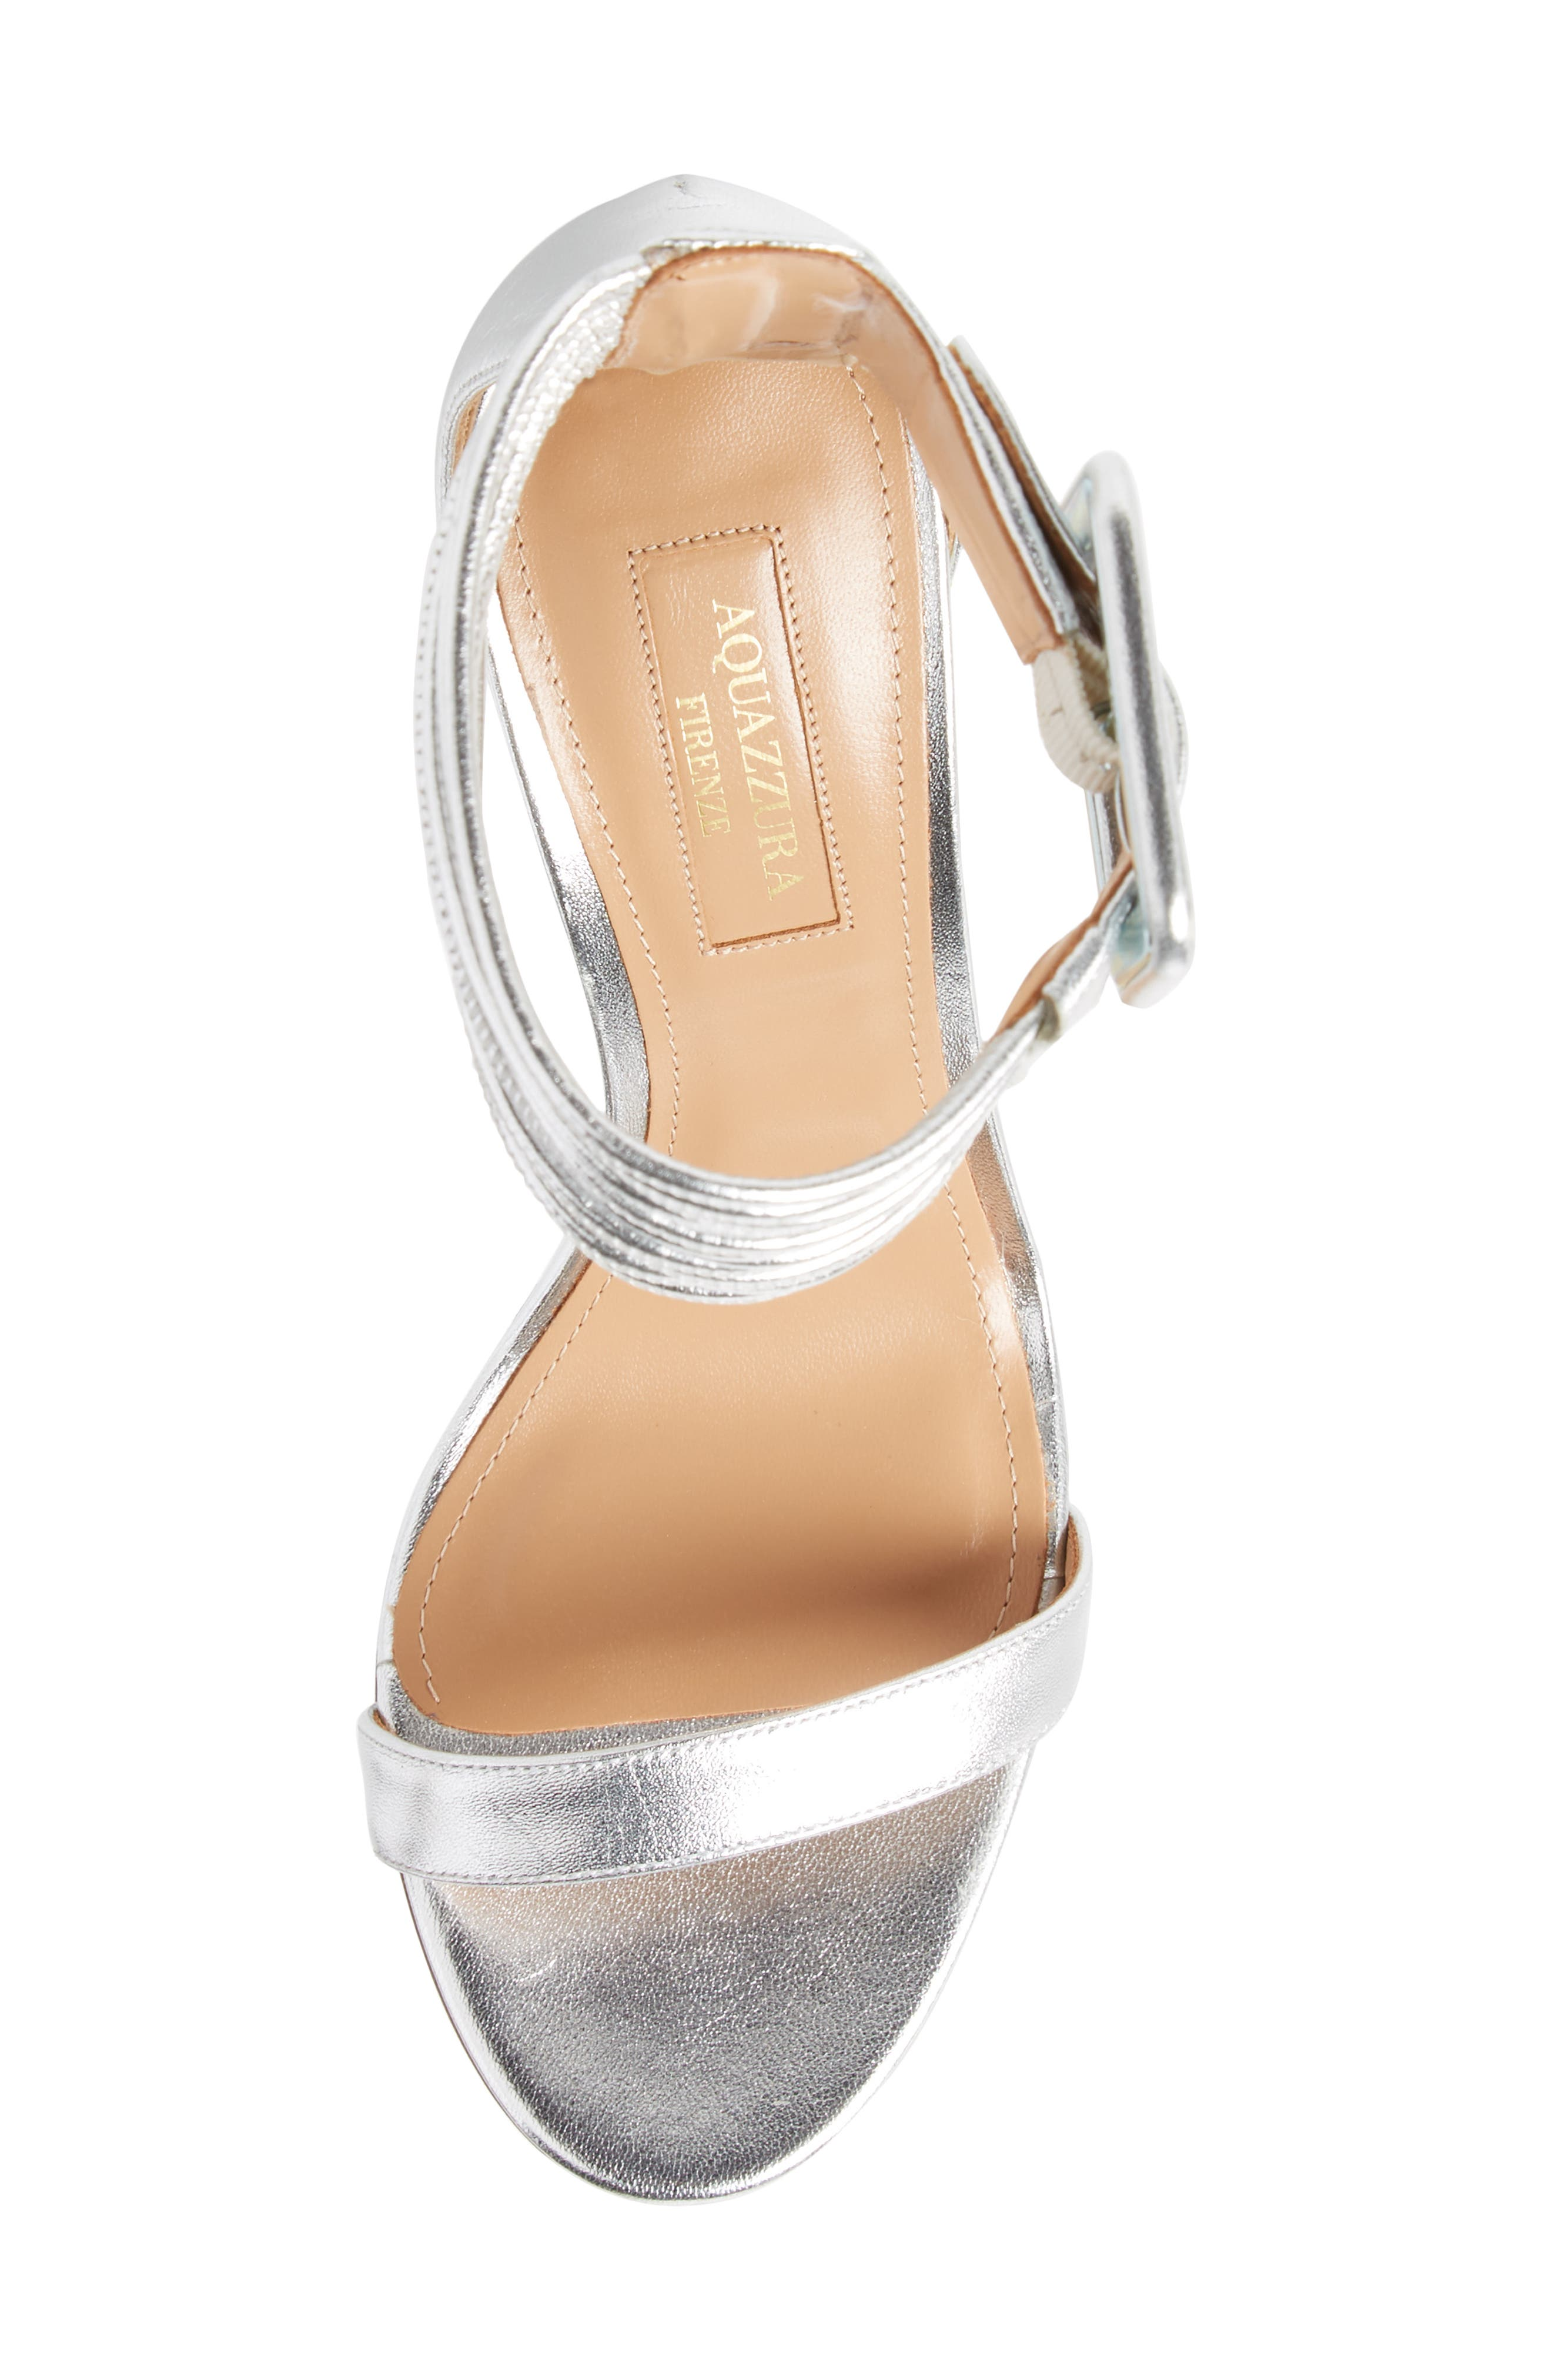 Casablanca Ankle Cuff Sandal,                             Alternate thumbnail 5, color,                             Silver